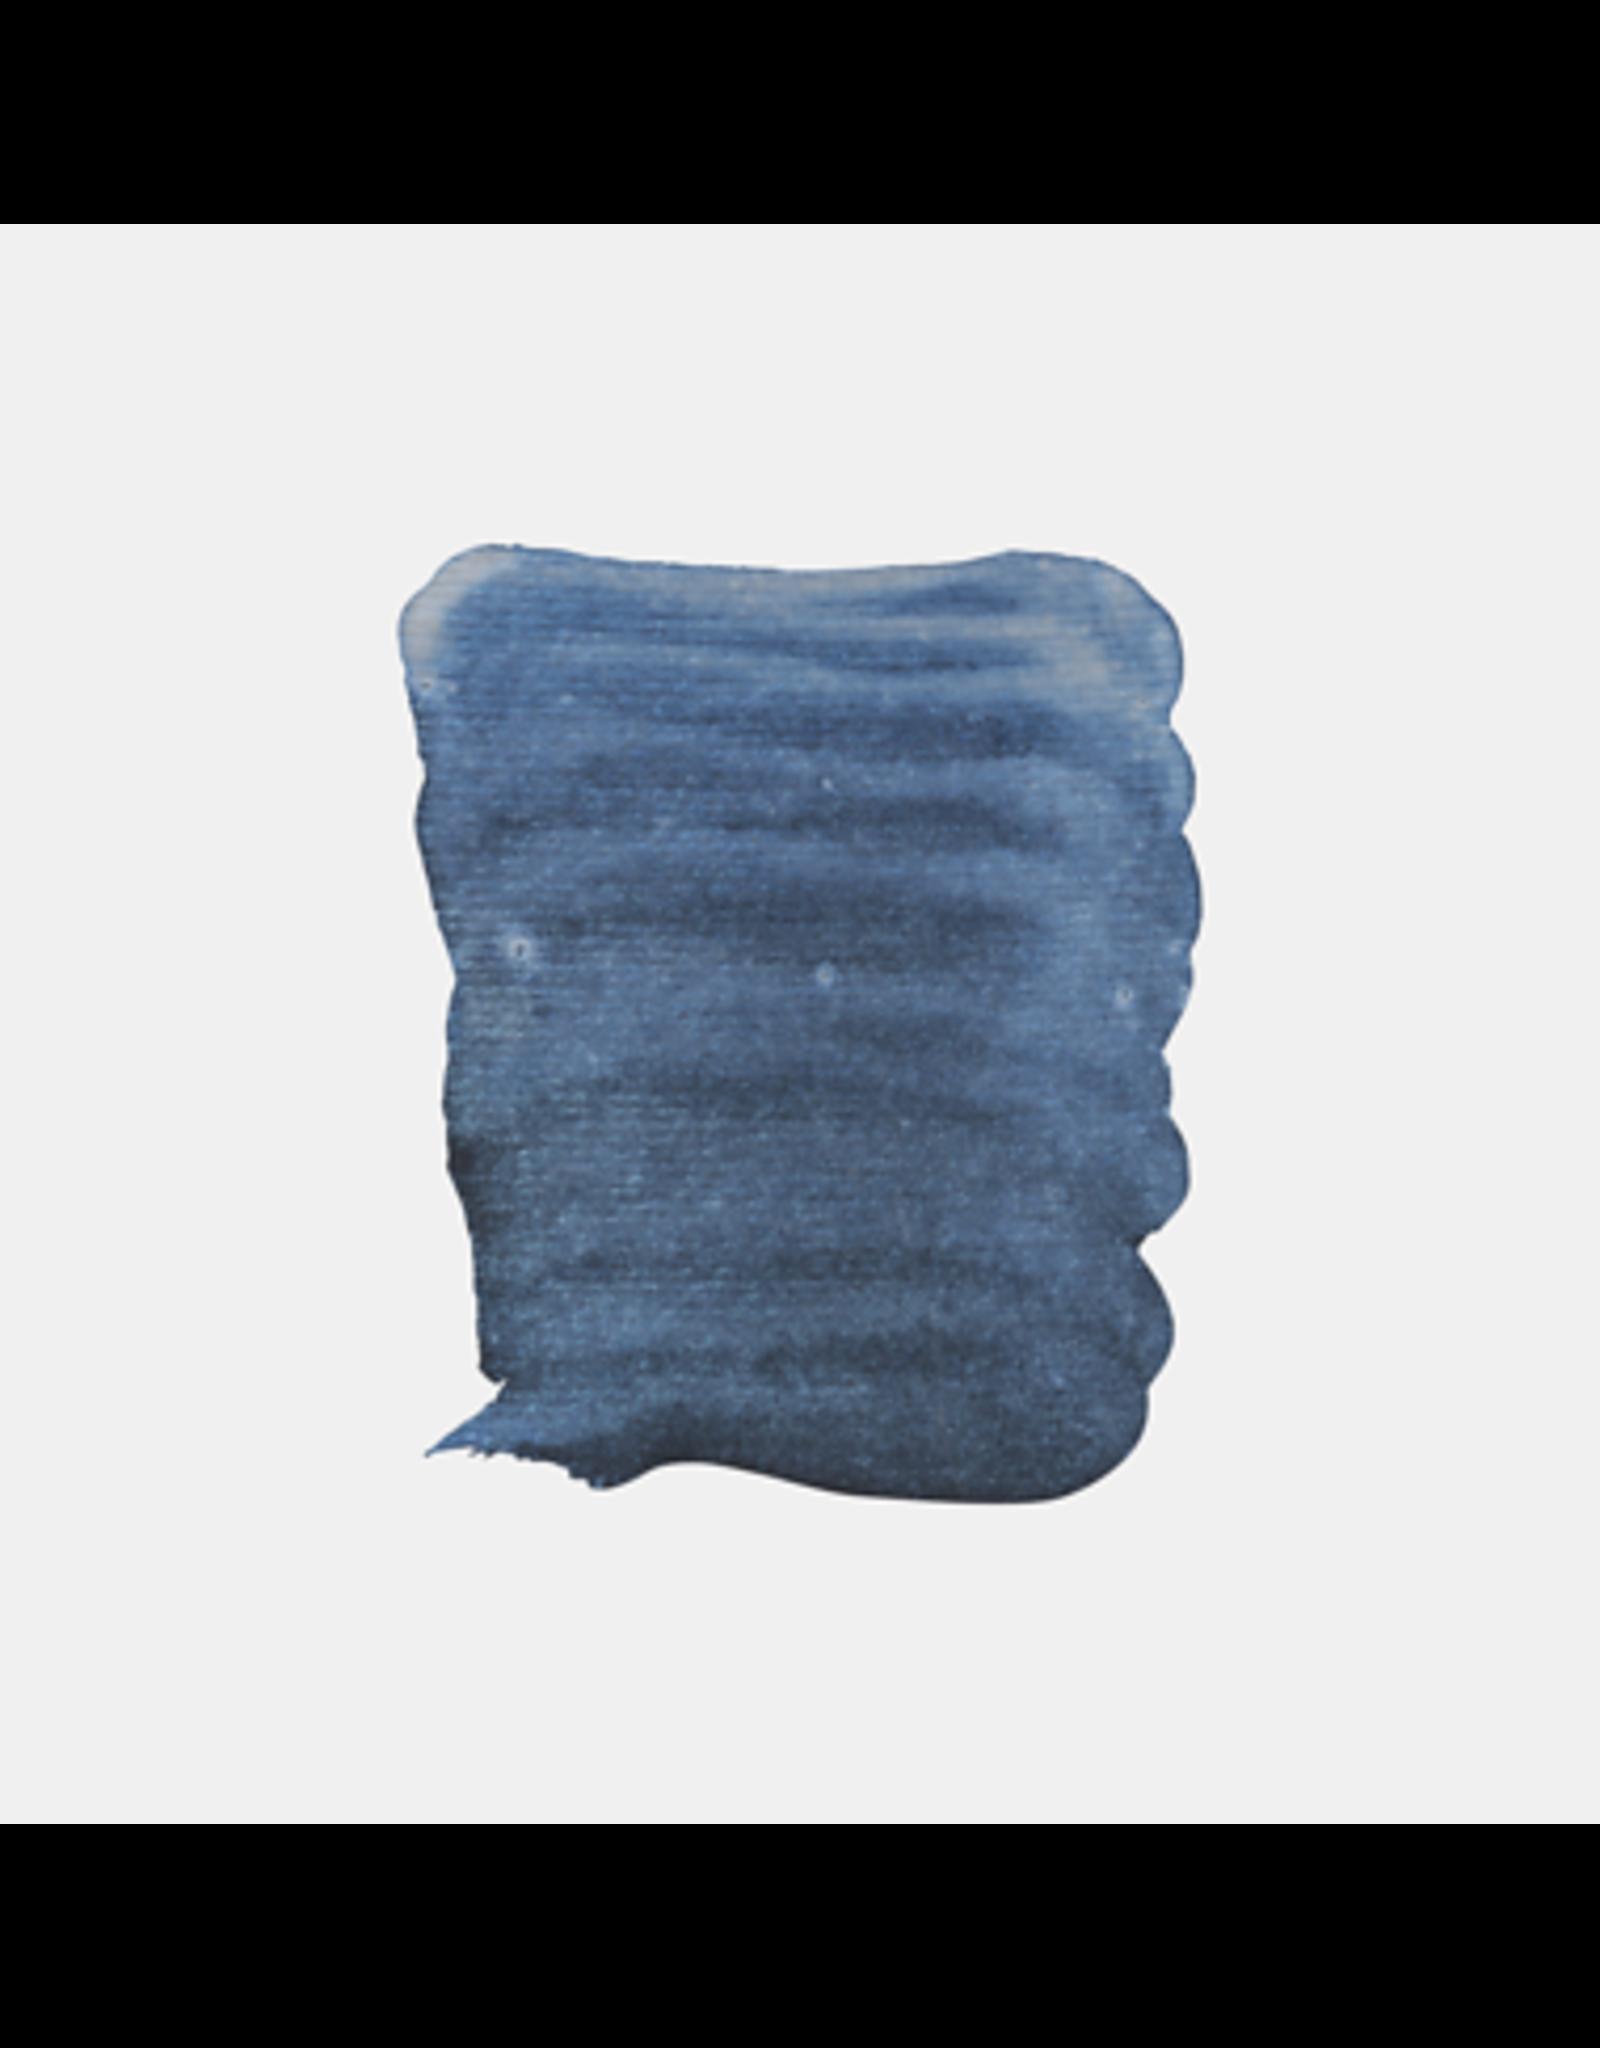 aquarel 1/2 napje interference blauw